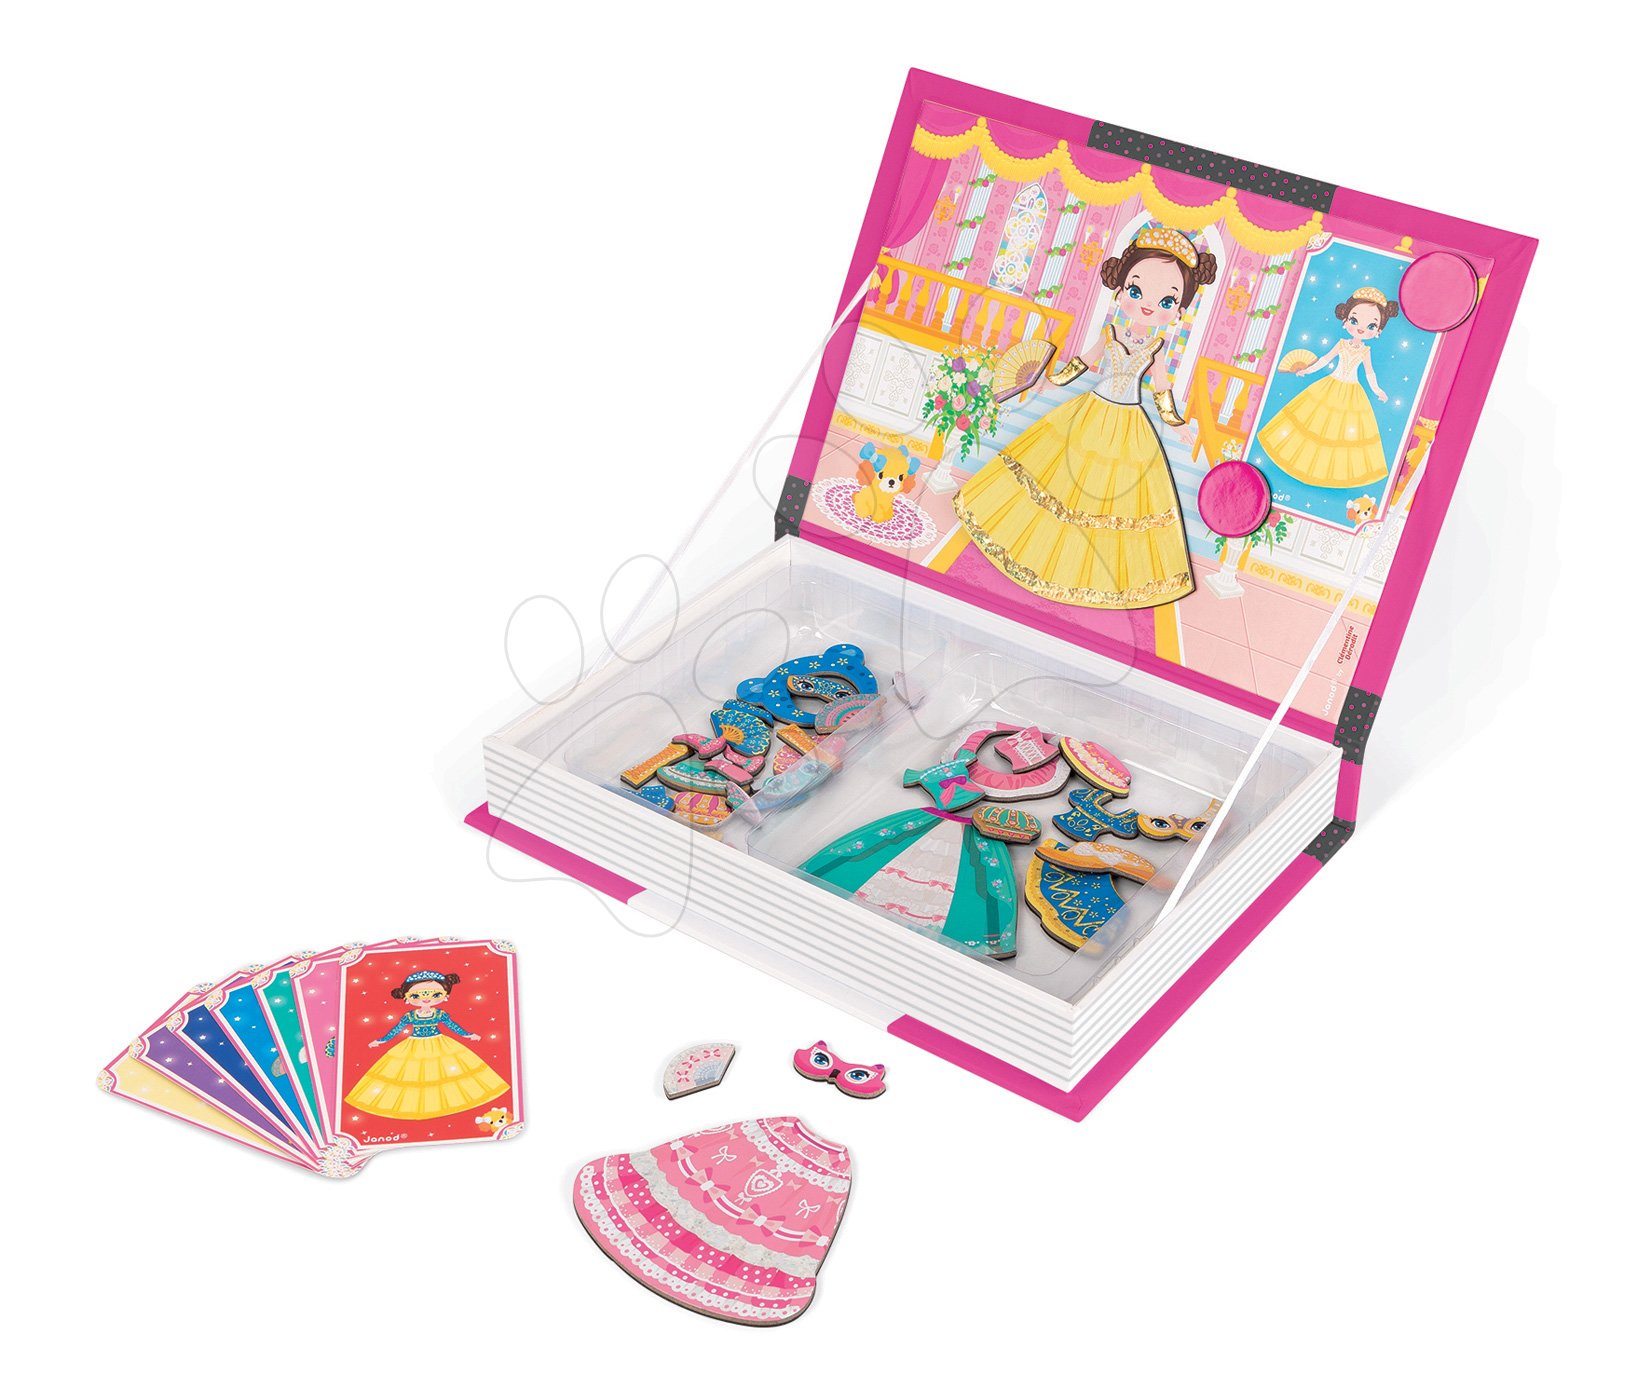 Magnetky pre deti - Magnetická kniha Princezné Magnetis'Book Janod 8 kariet